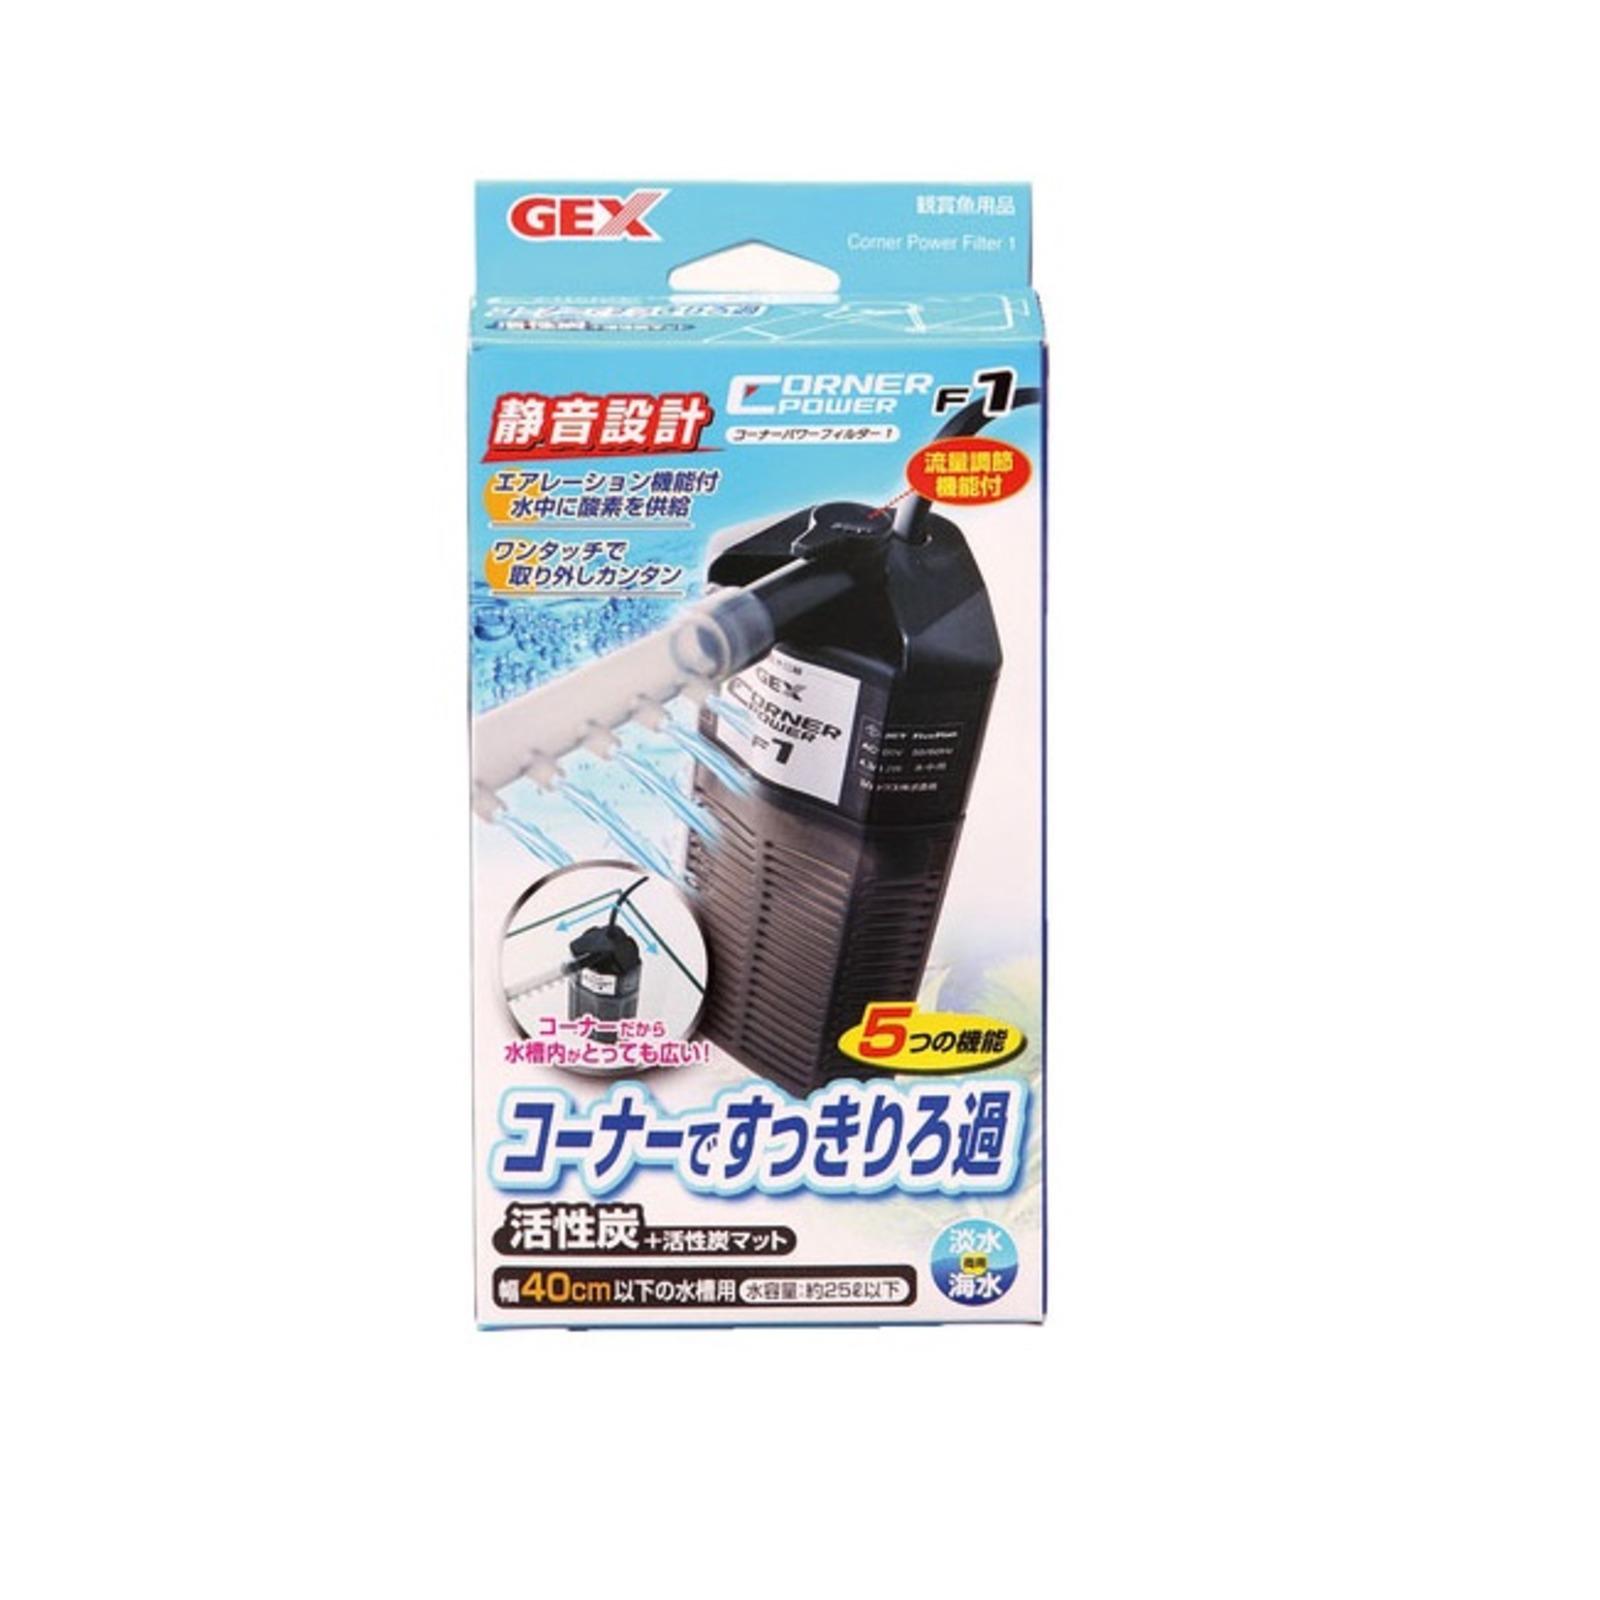 Gex Corner Power Filter S